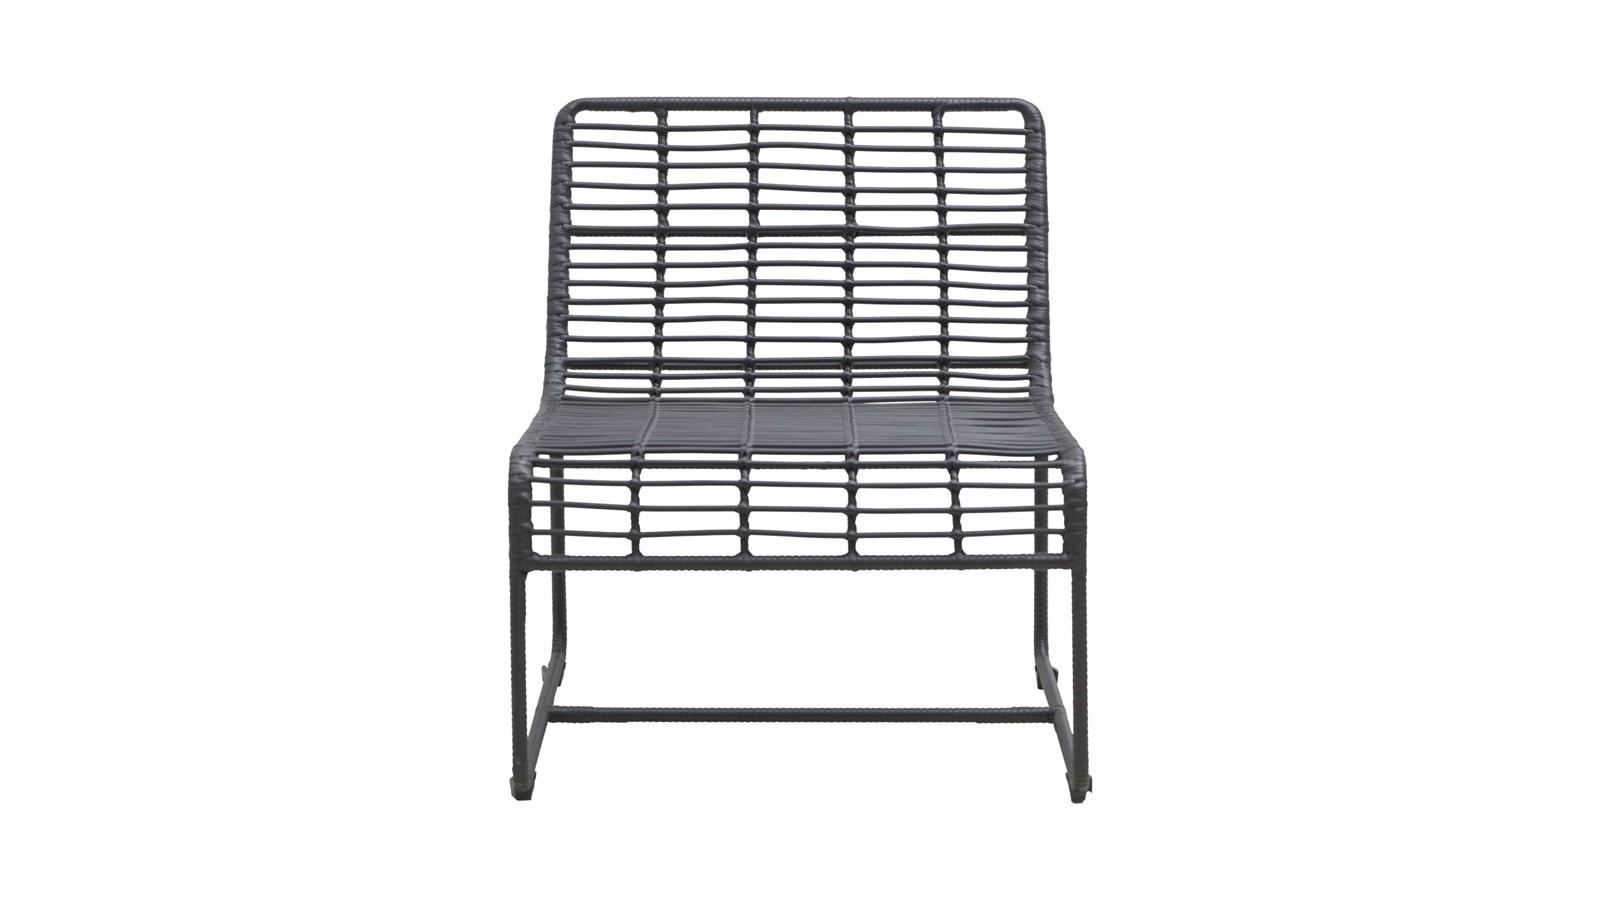 chaise de jardin en métal noir